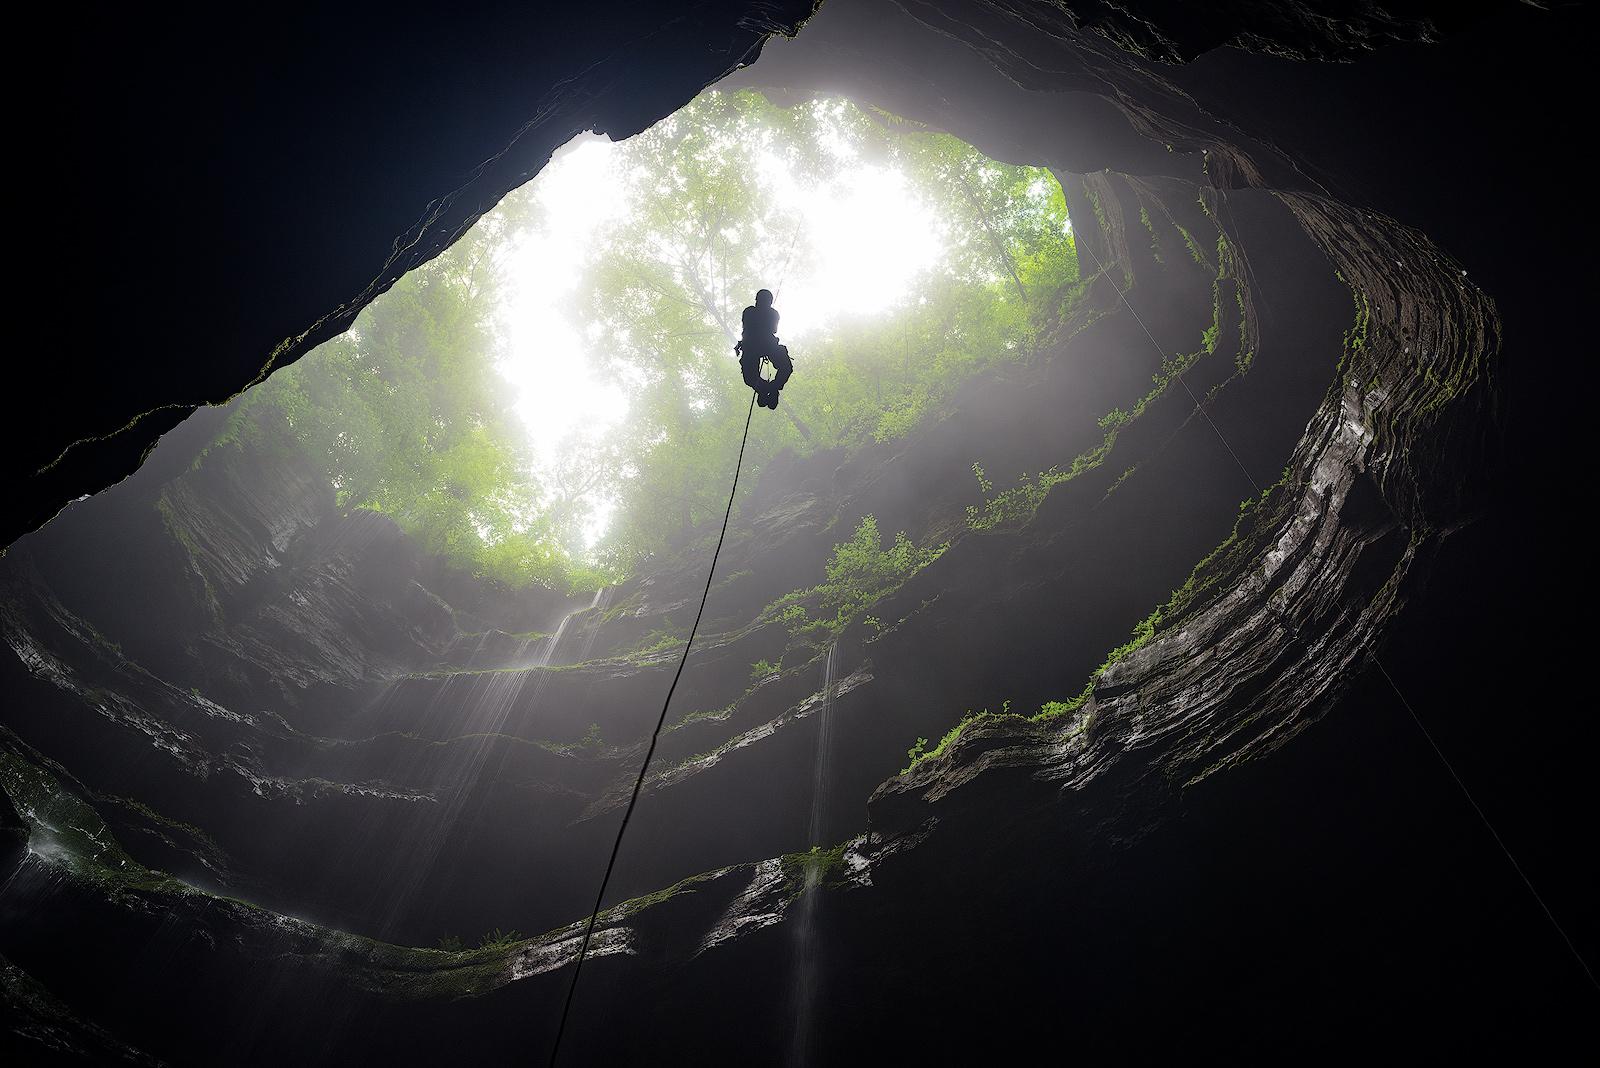 Neversink, Neversink Cave Preserve, Alabama, jackson county, waterfall, pit, fens, moss, southeastern cave conservancy, limestone, sports, extreme sports, climbing, sinkhole, photo